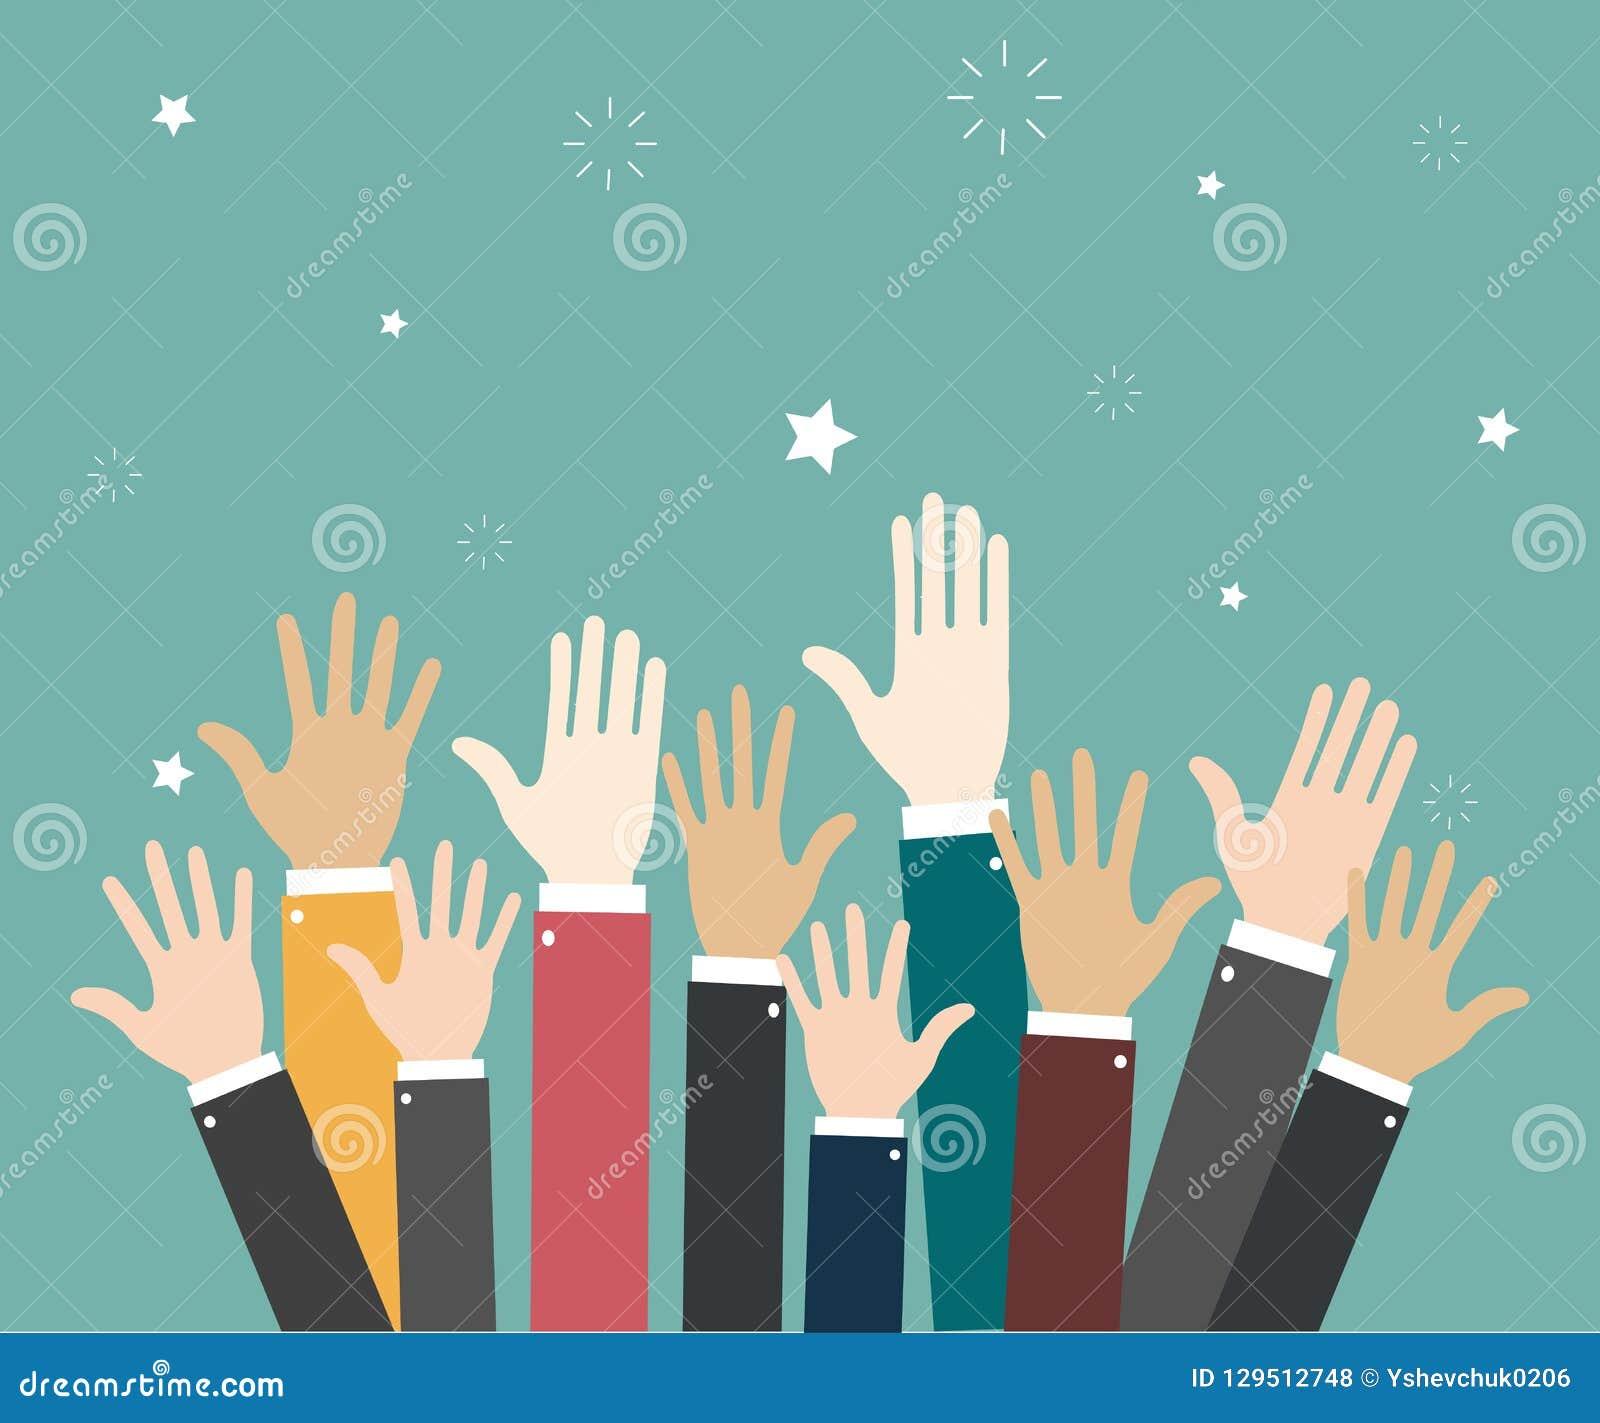 Raise hands Hand gesturing Volunteering Voting. Green background. Vector illustration